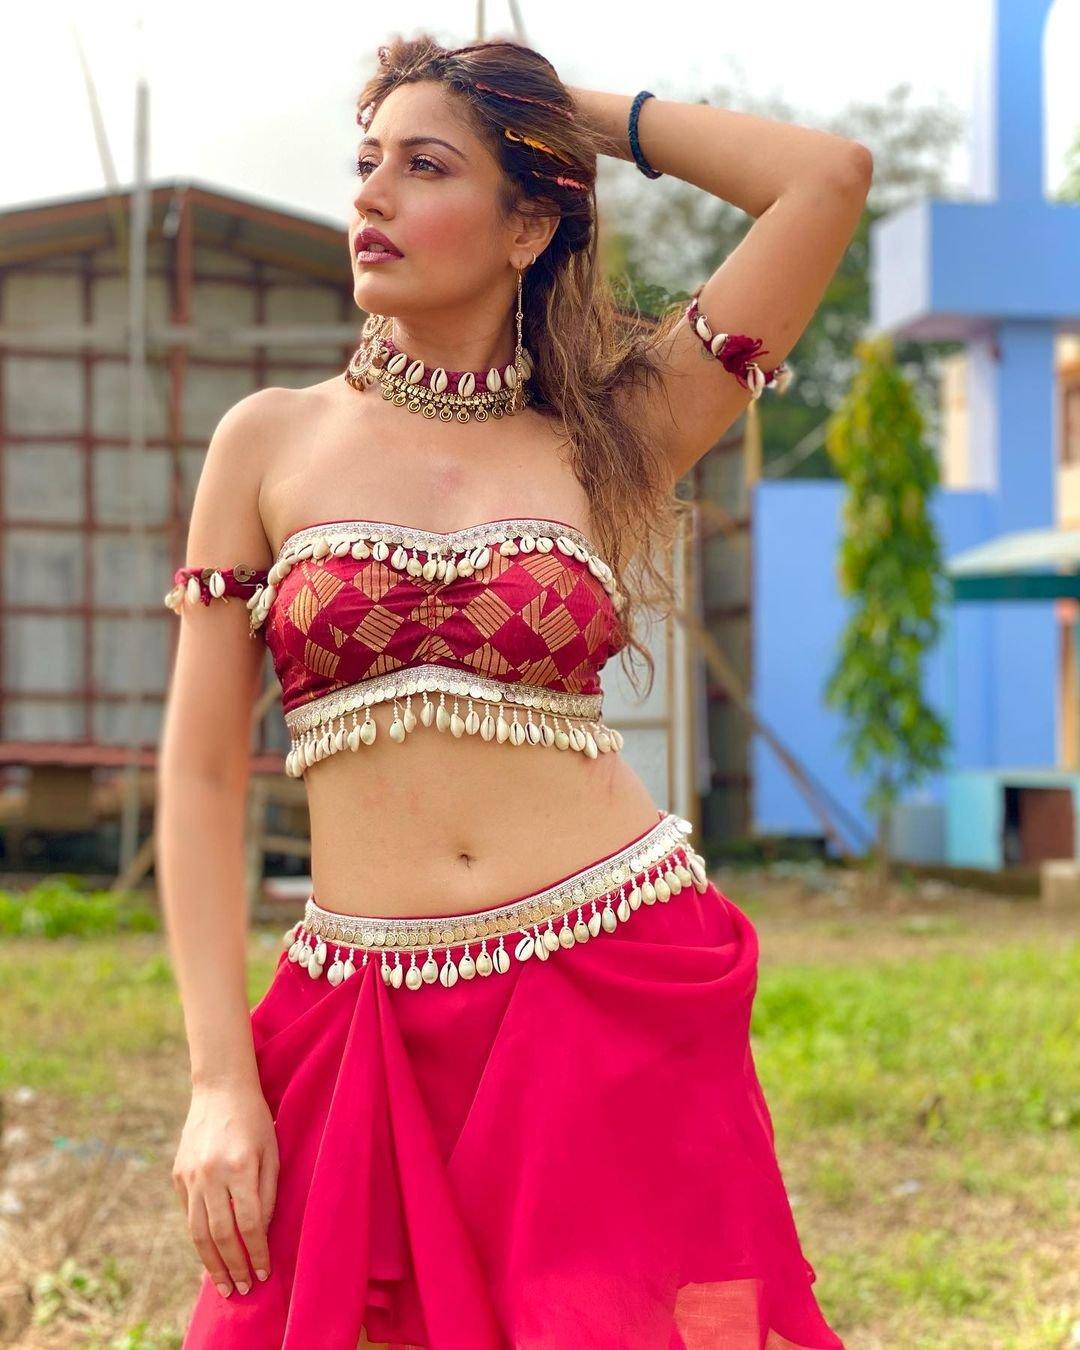 Surbhi Chandna looks stunning in a short whtie dress